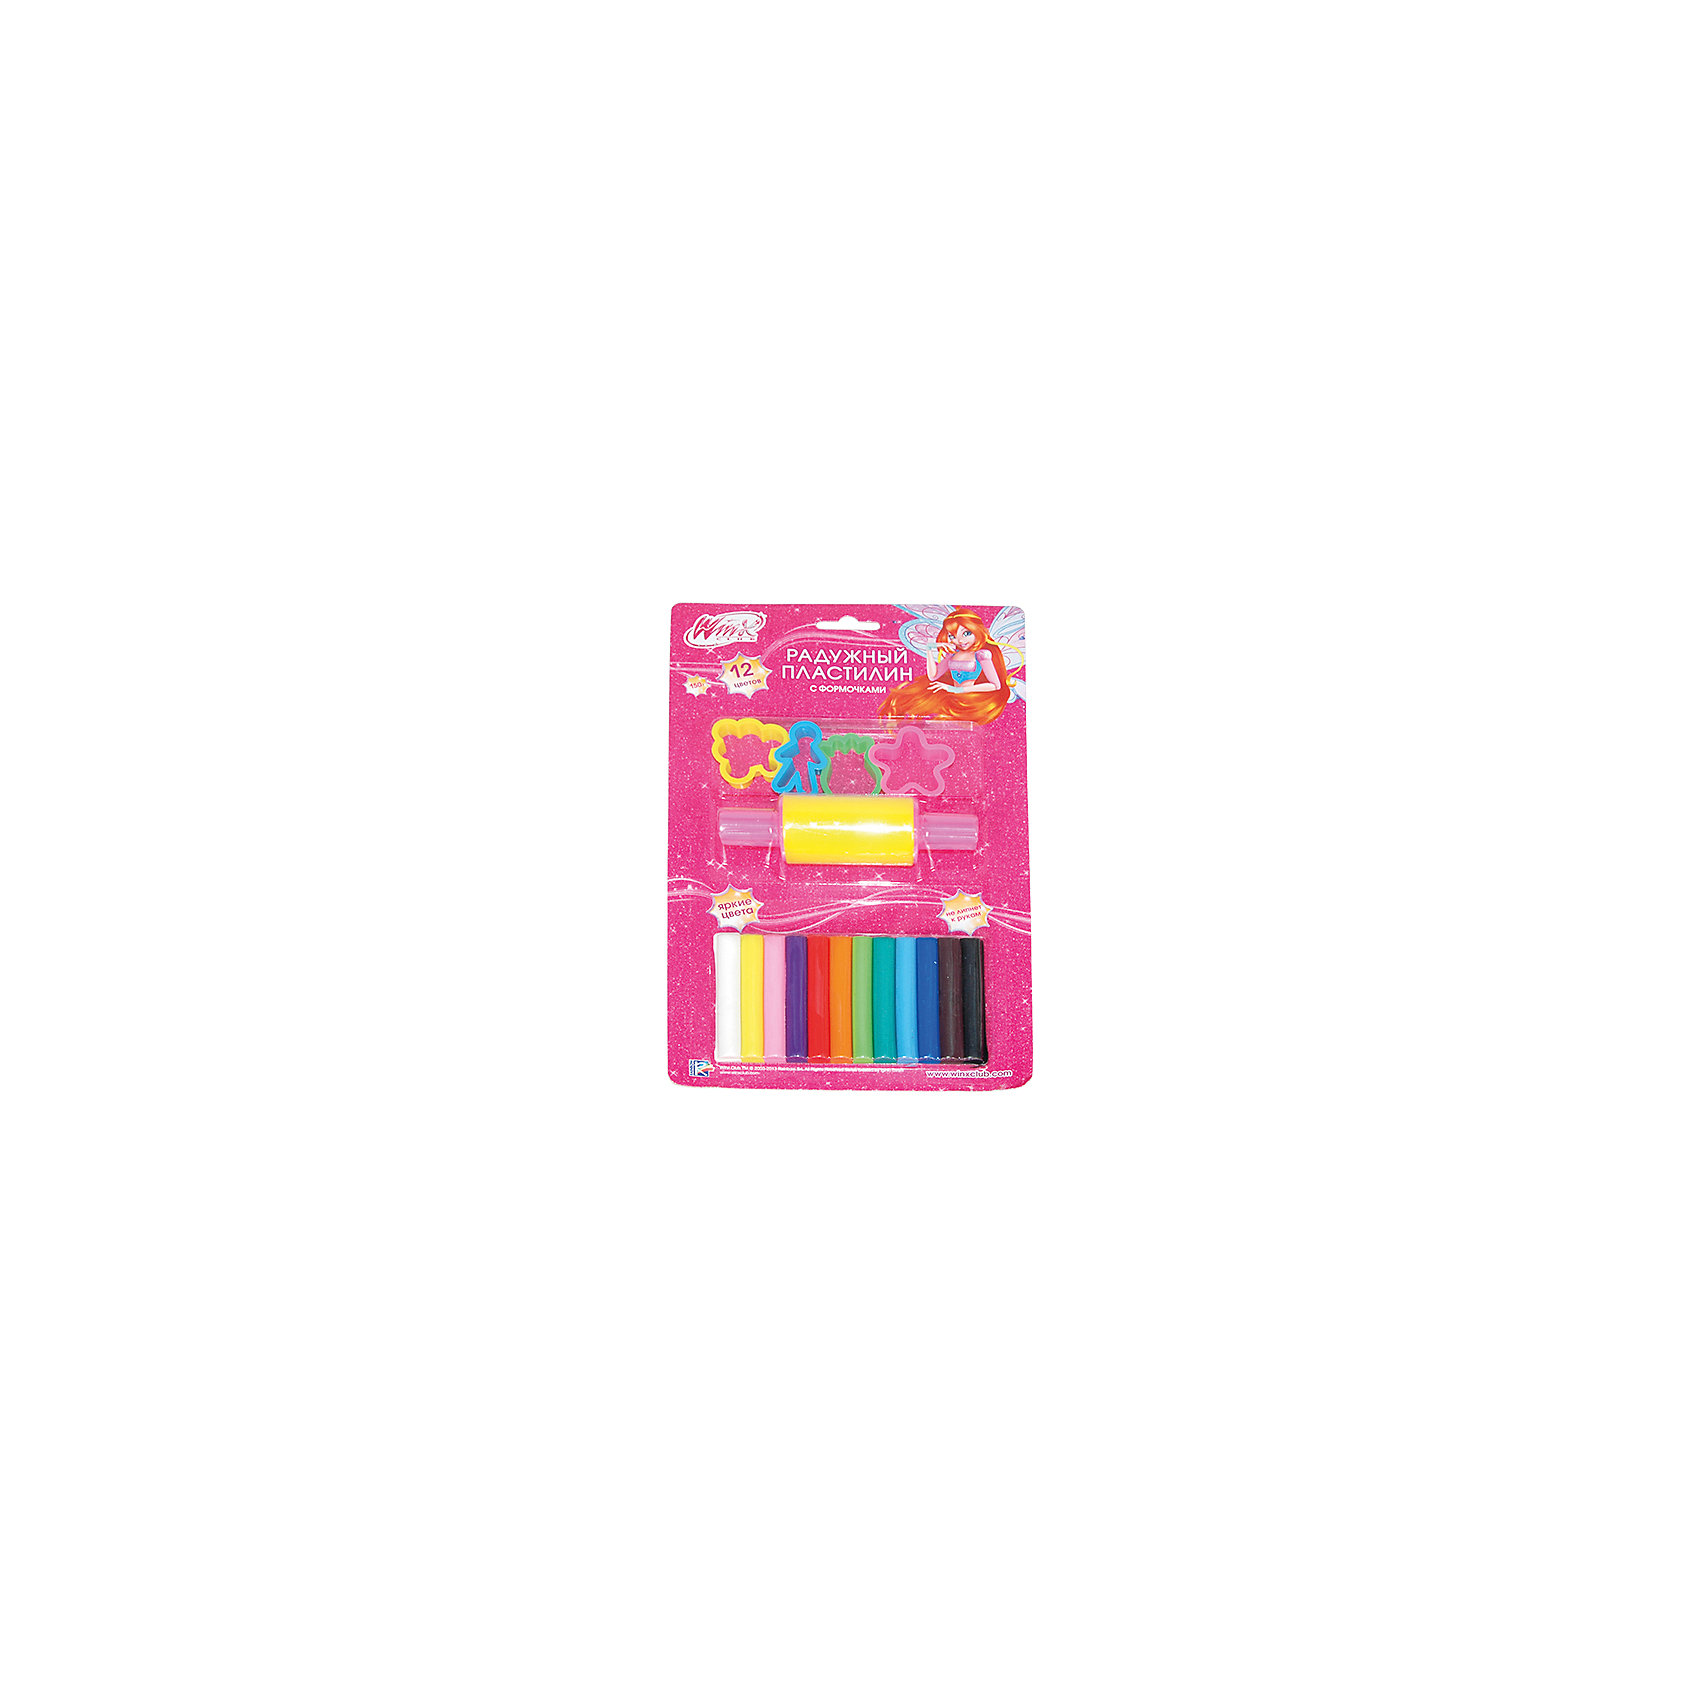 Пластилин с формочками, Winx Club, 12 цветов